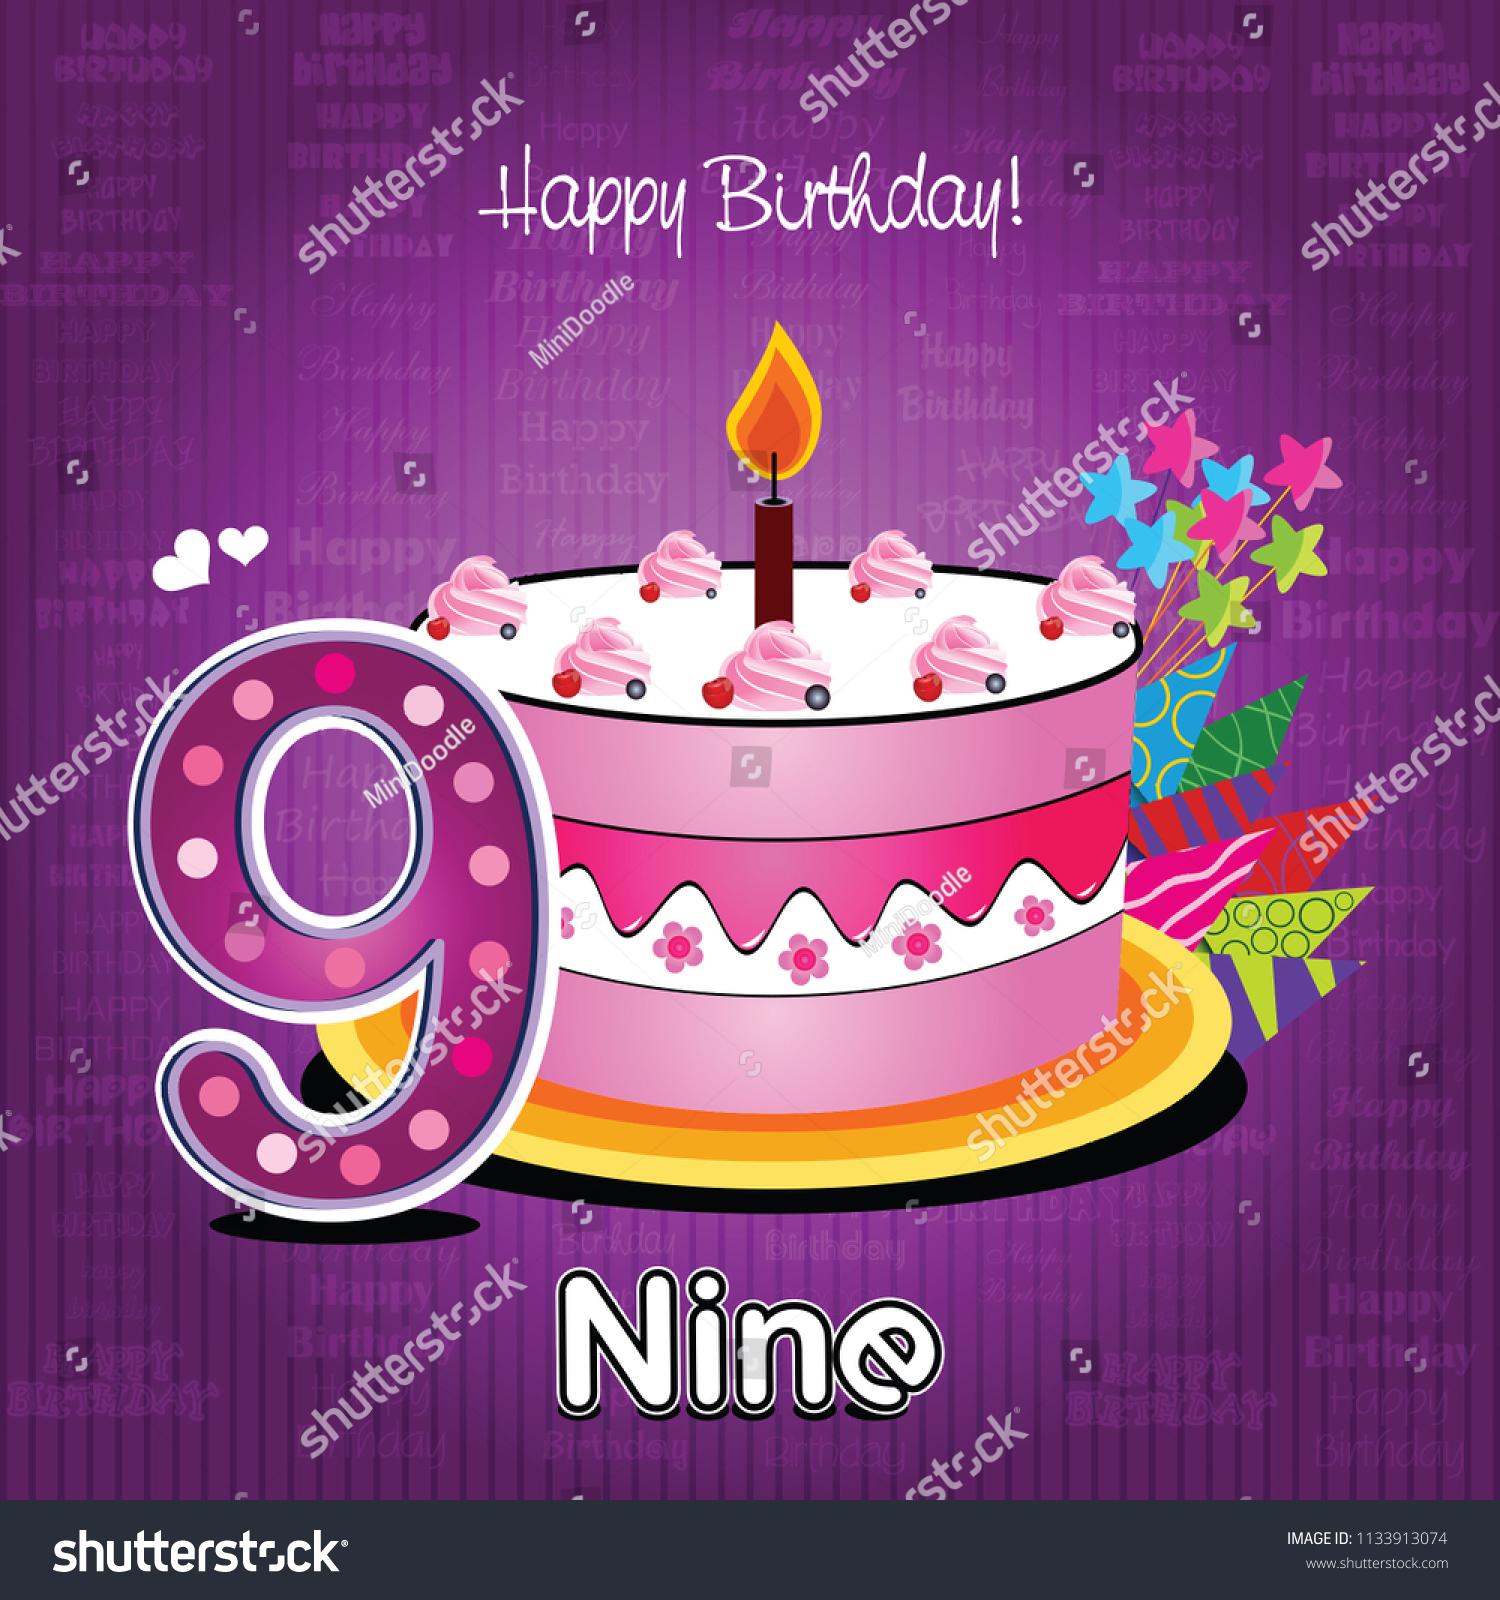 Vector Happy Birthday Card Cake Numbers Image Vectorielle De Stock